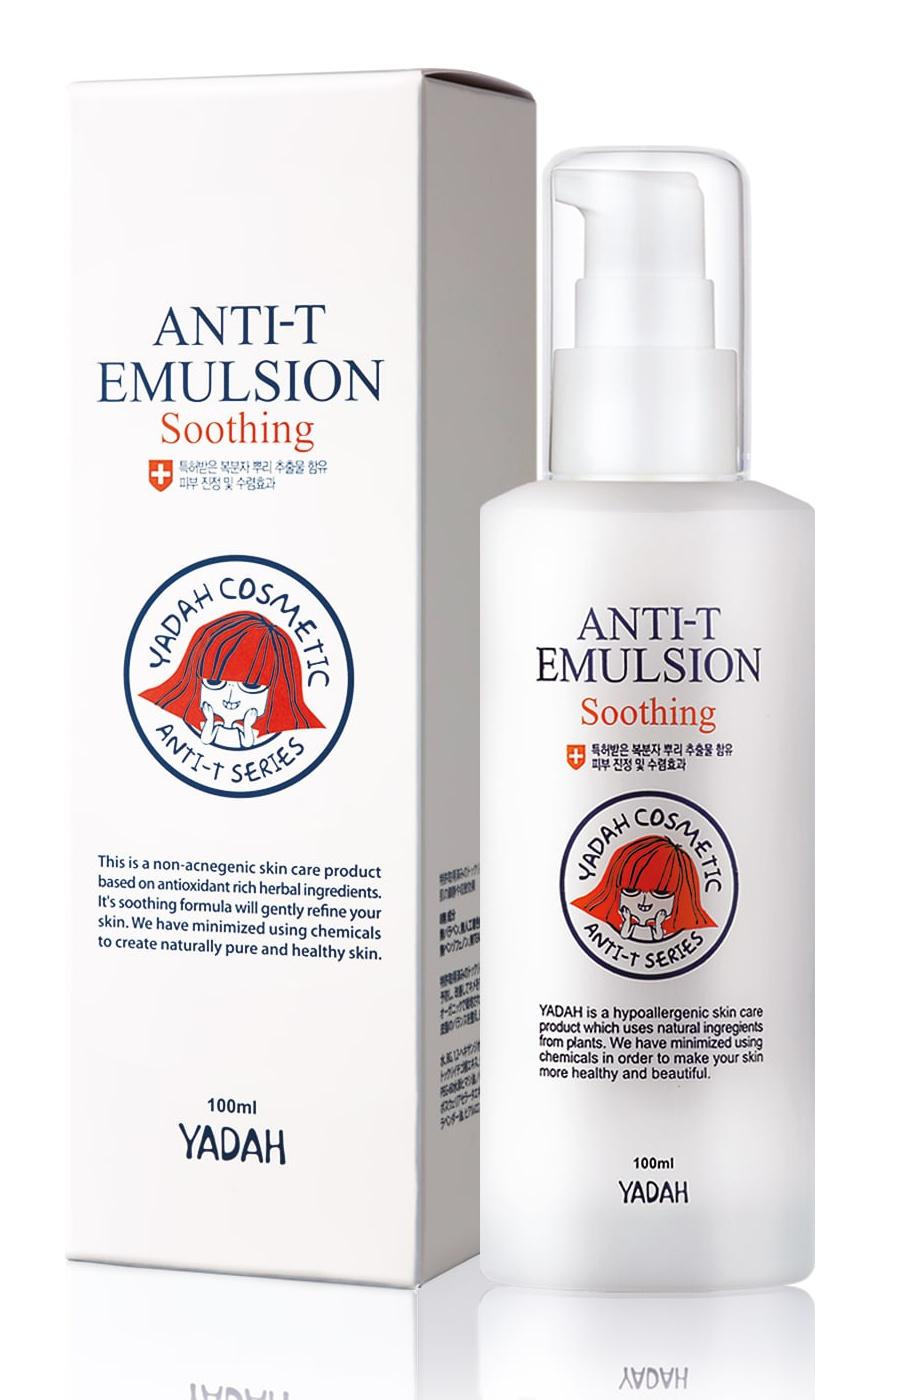 Yadah Cosmetics Anti-T Emulsion